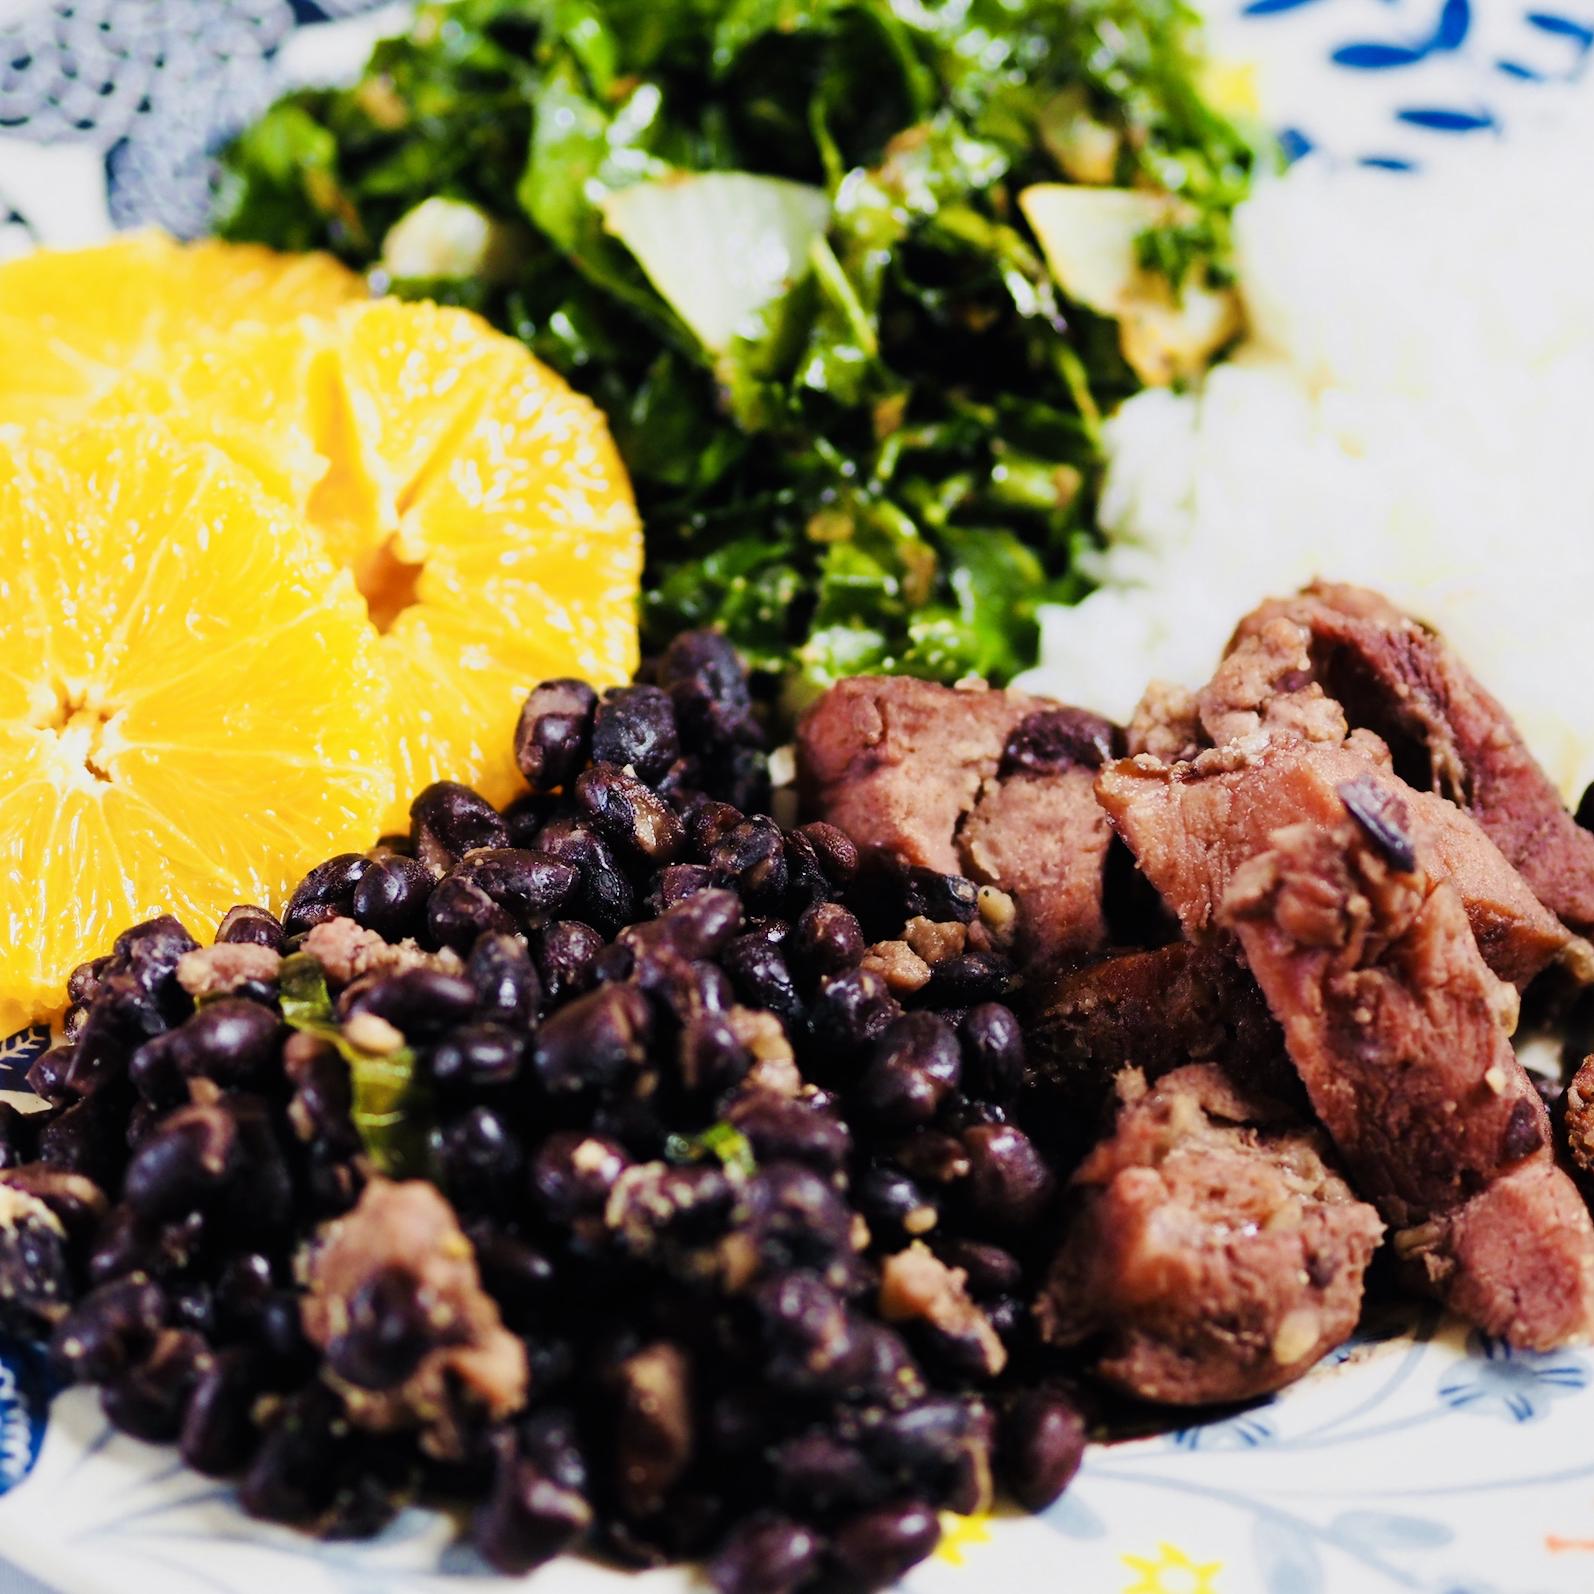 Feijoada Nordestino (Northeastern Brazilian Black Bean Stew) mgomez_usa@yahoo.com